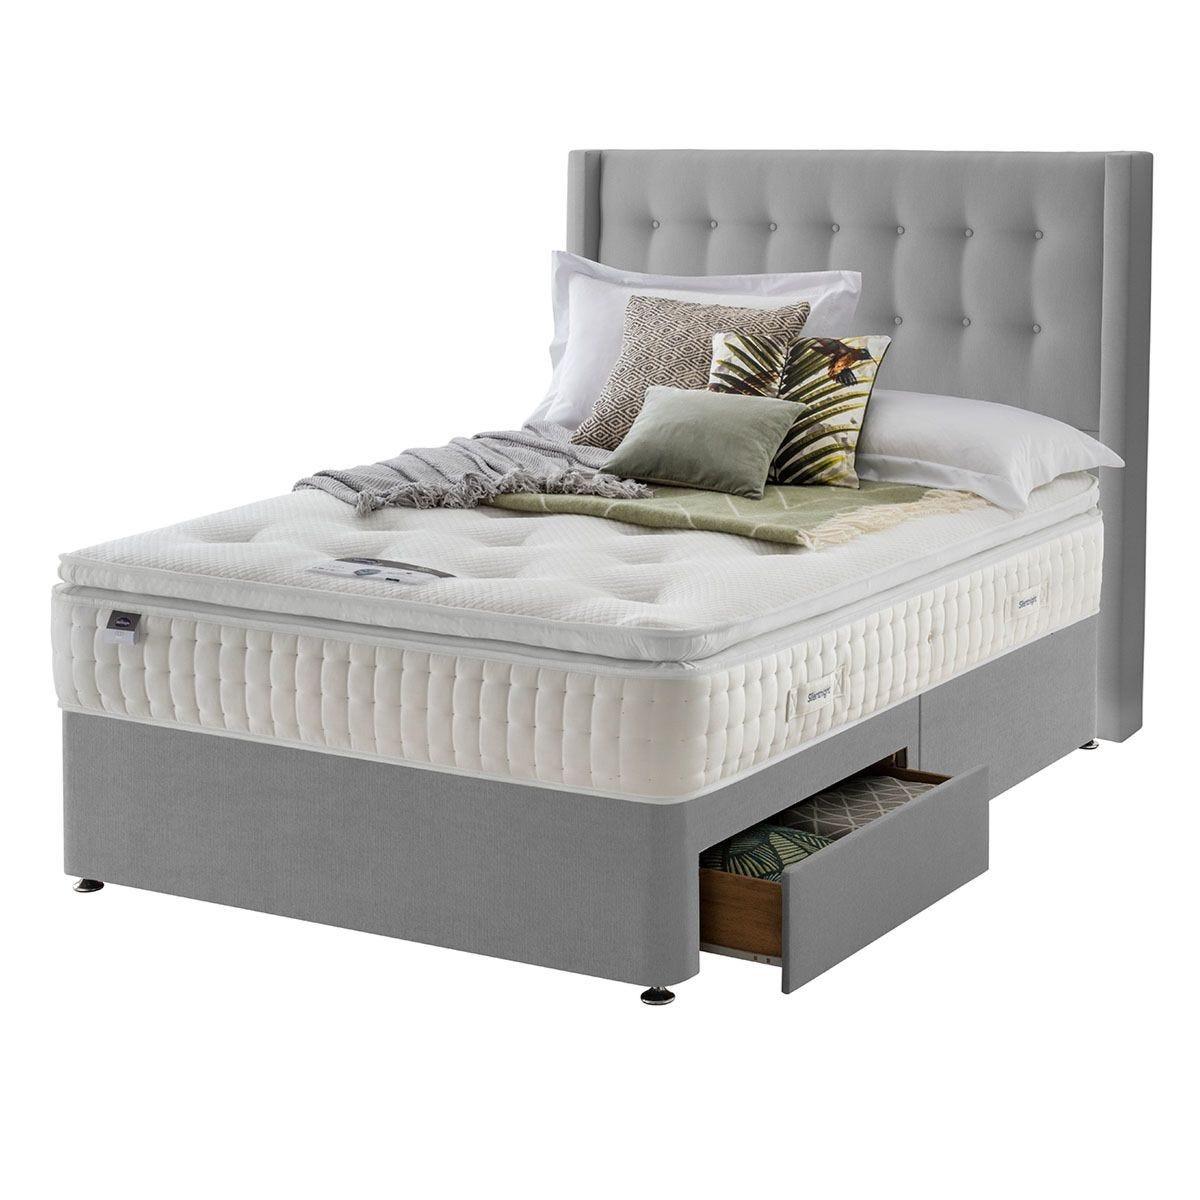 Silentnight Mirapocket Latex 1400 2-Drawer Divan Bed - Grey